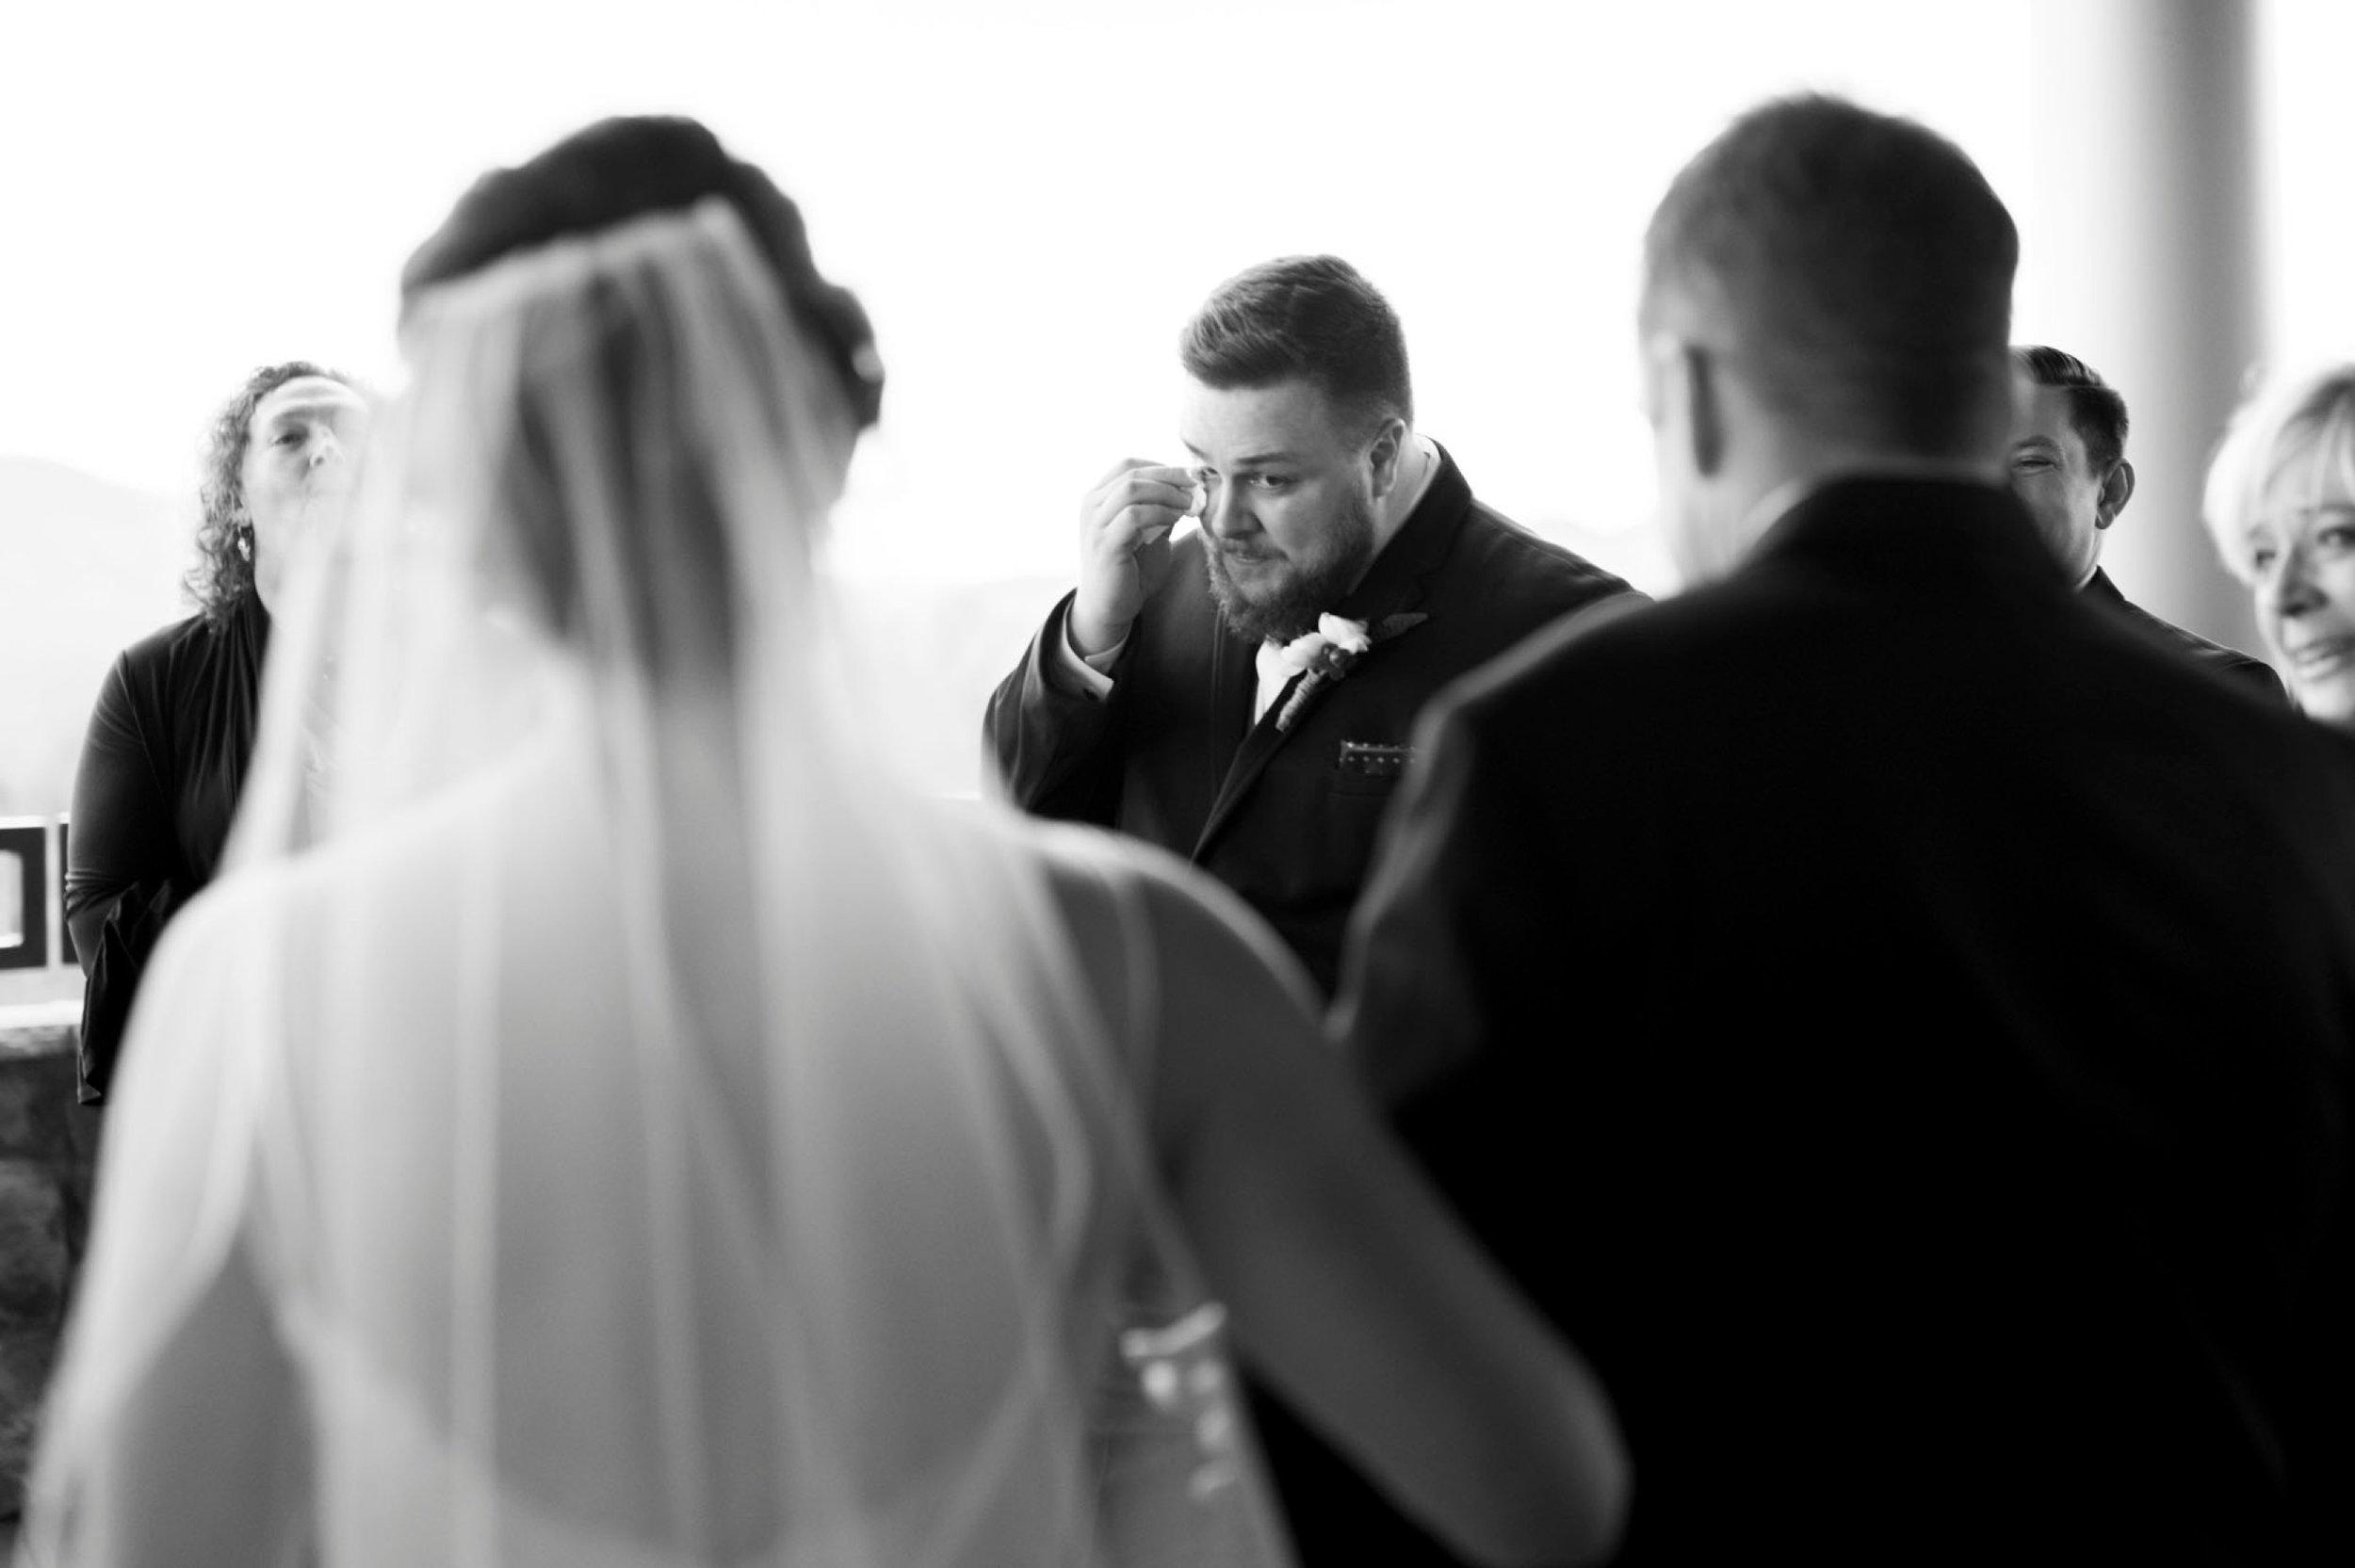 IrvineEstate_LexingtonVA_Wedding_FallWedding_VirginiaWeddingPhotographer 58.jpg